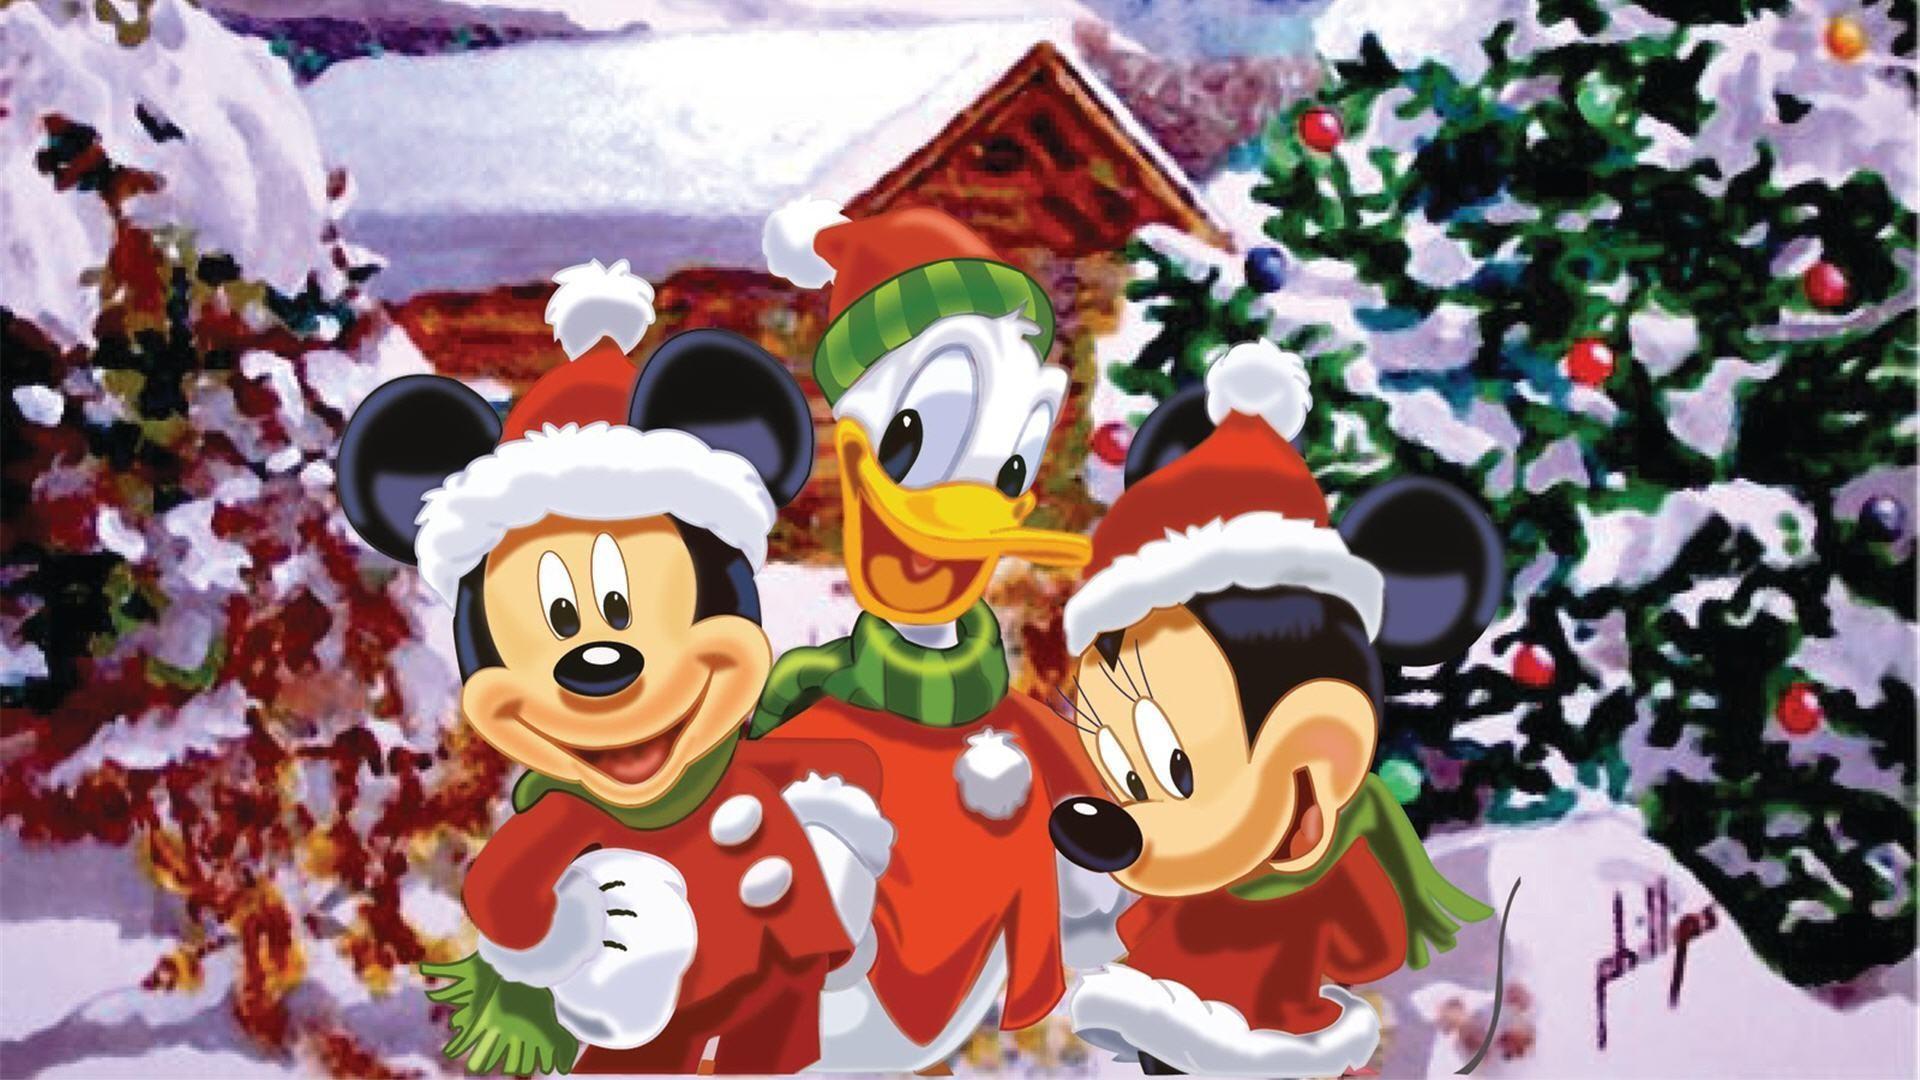 Mickey Mouse Christmas Wallpaper Wallpapertag